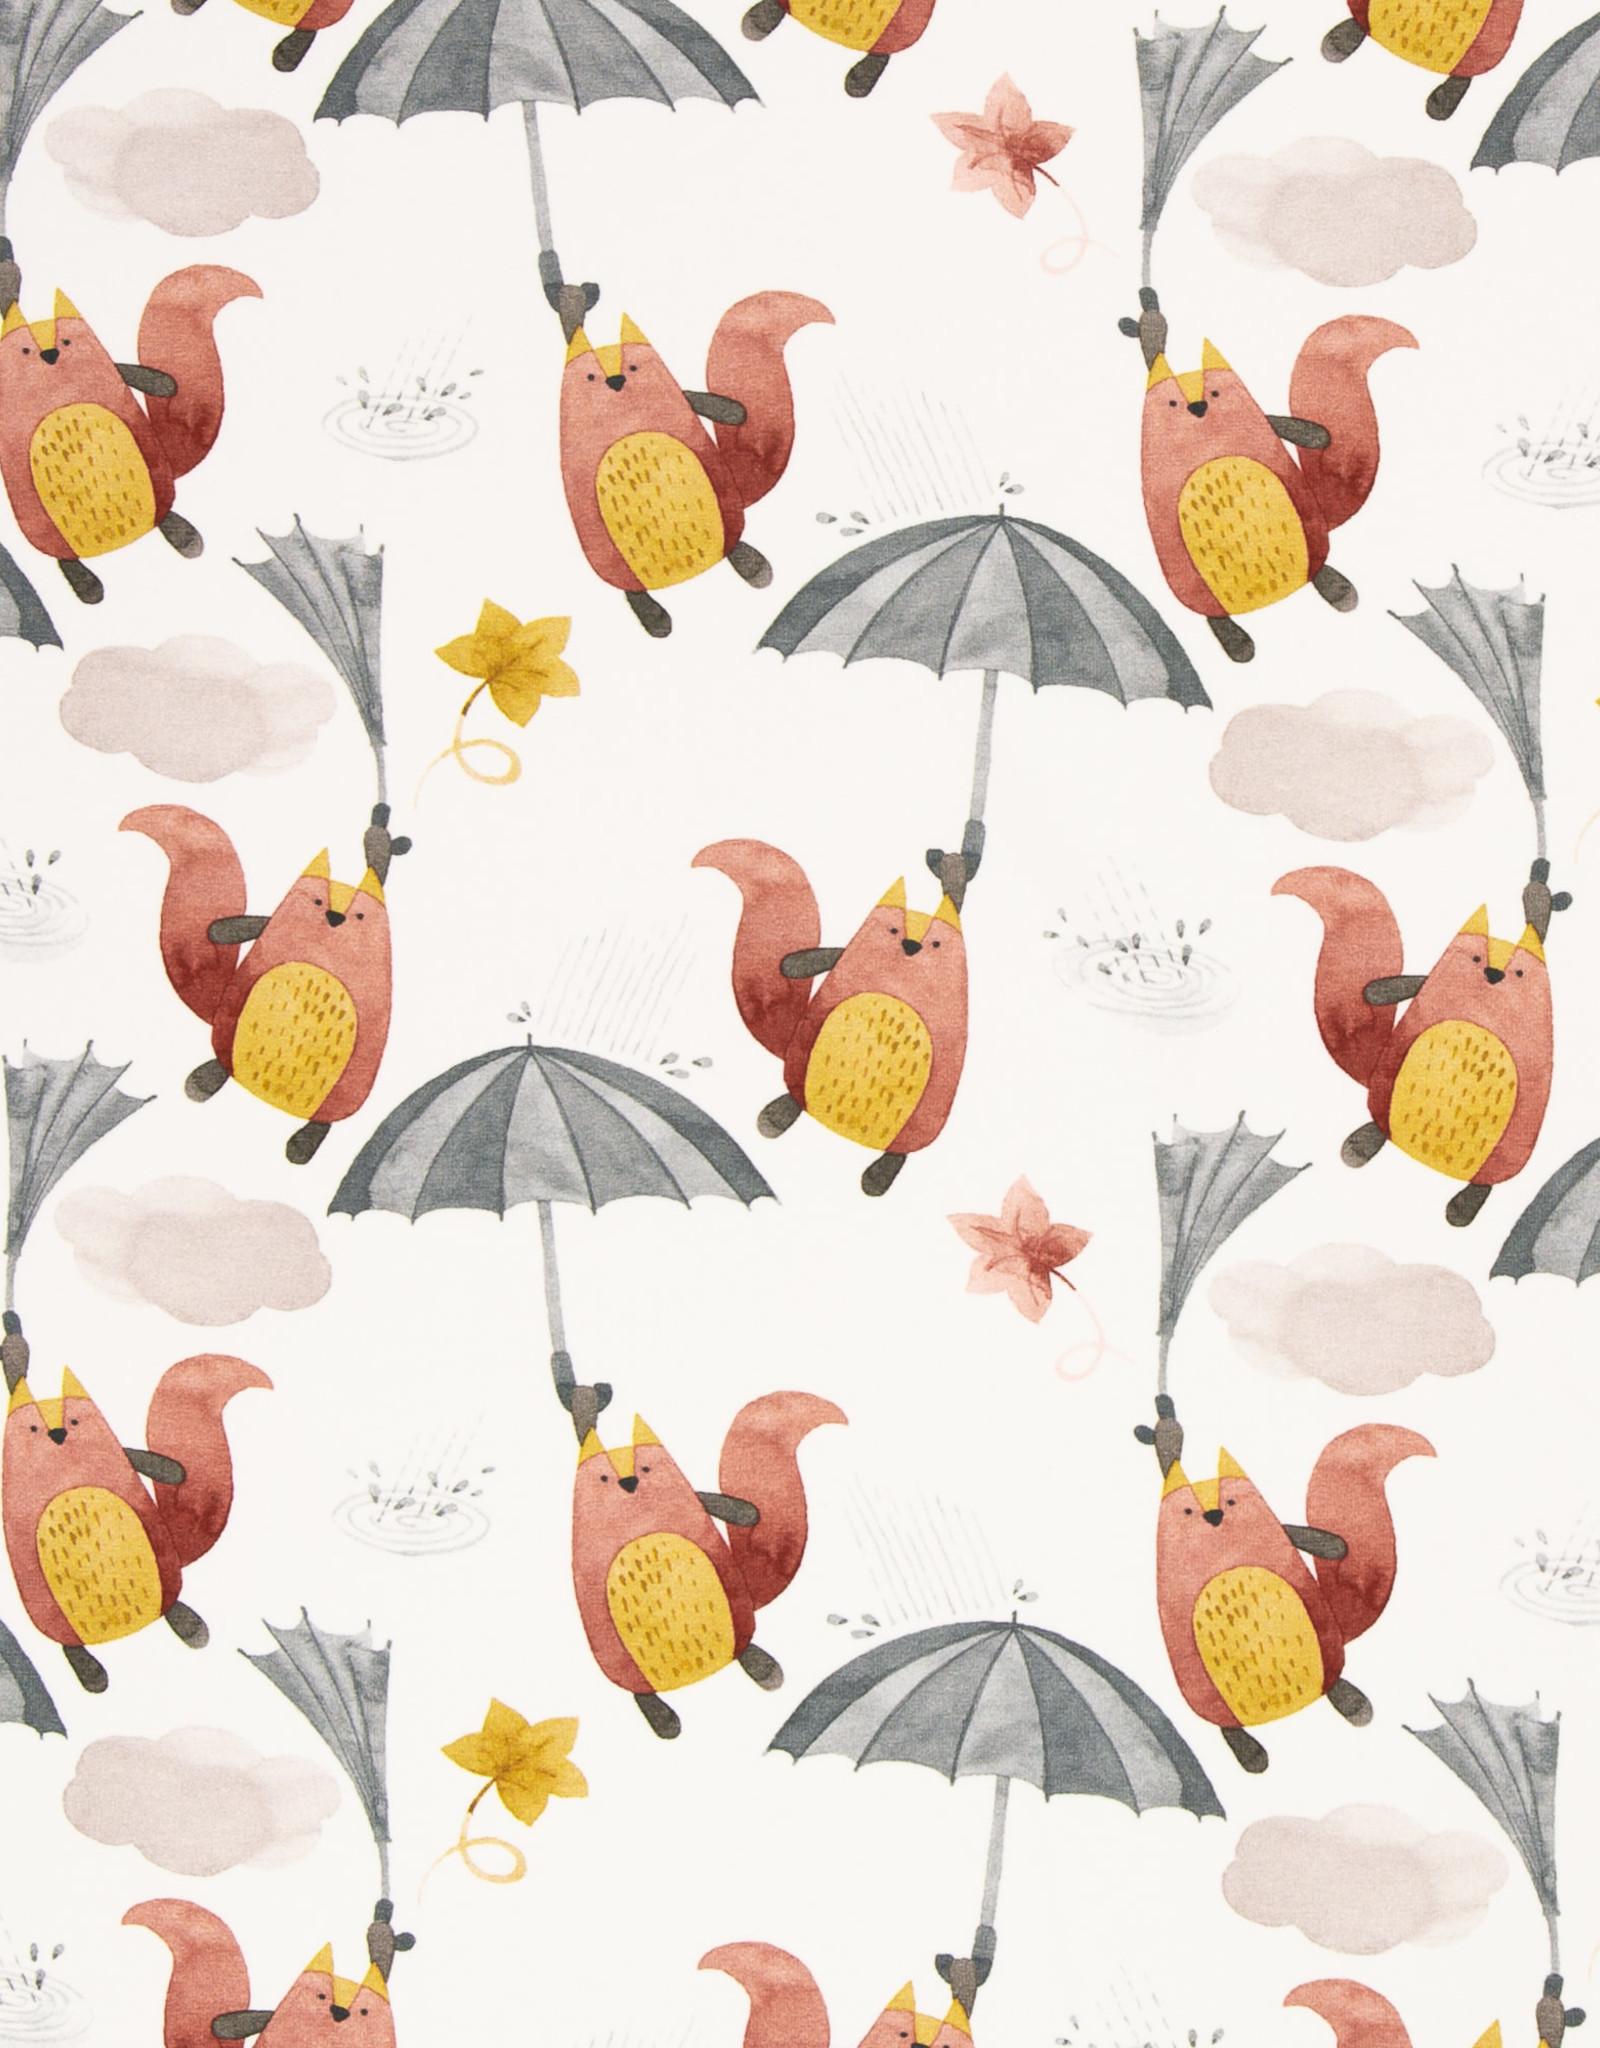 Tricot - Floating Umbrella